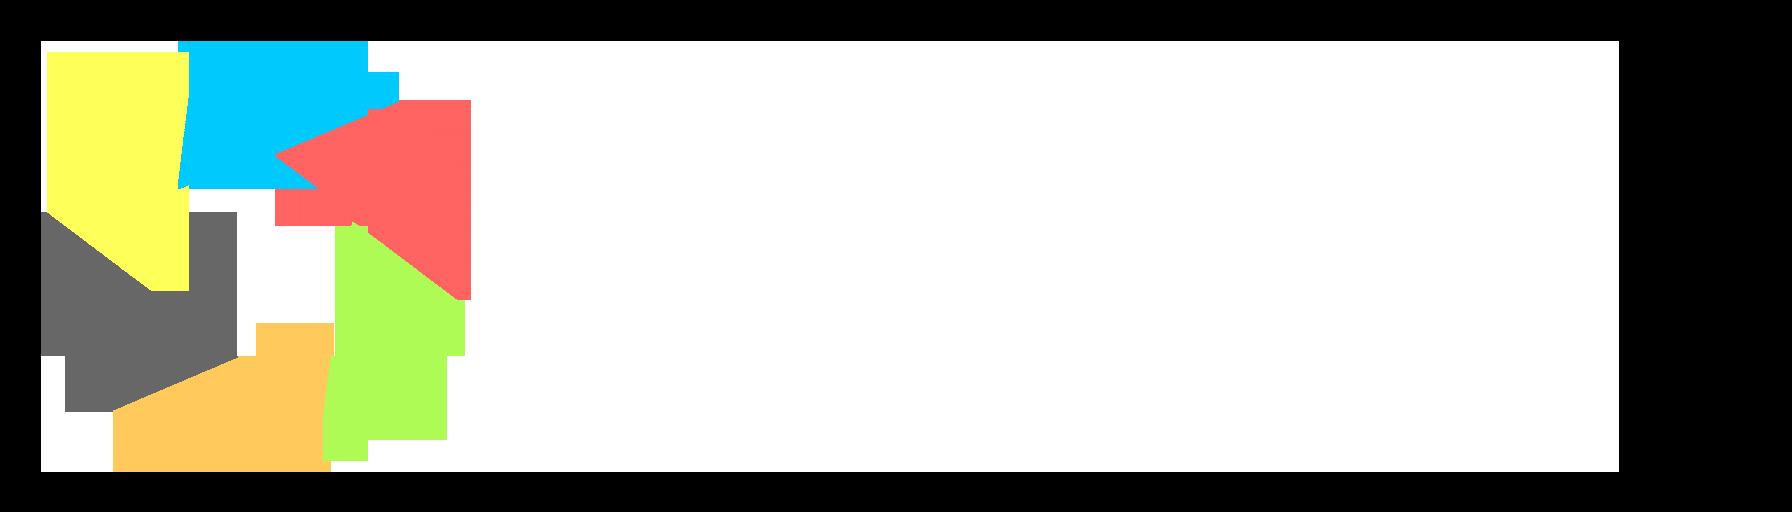 Fotoclub Digitaal Zien